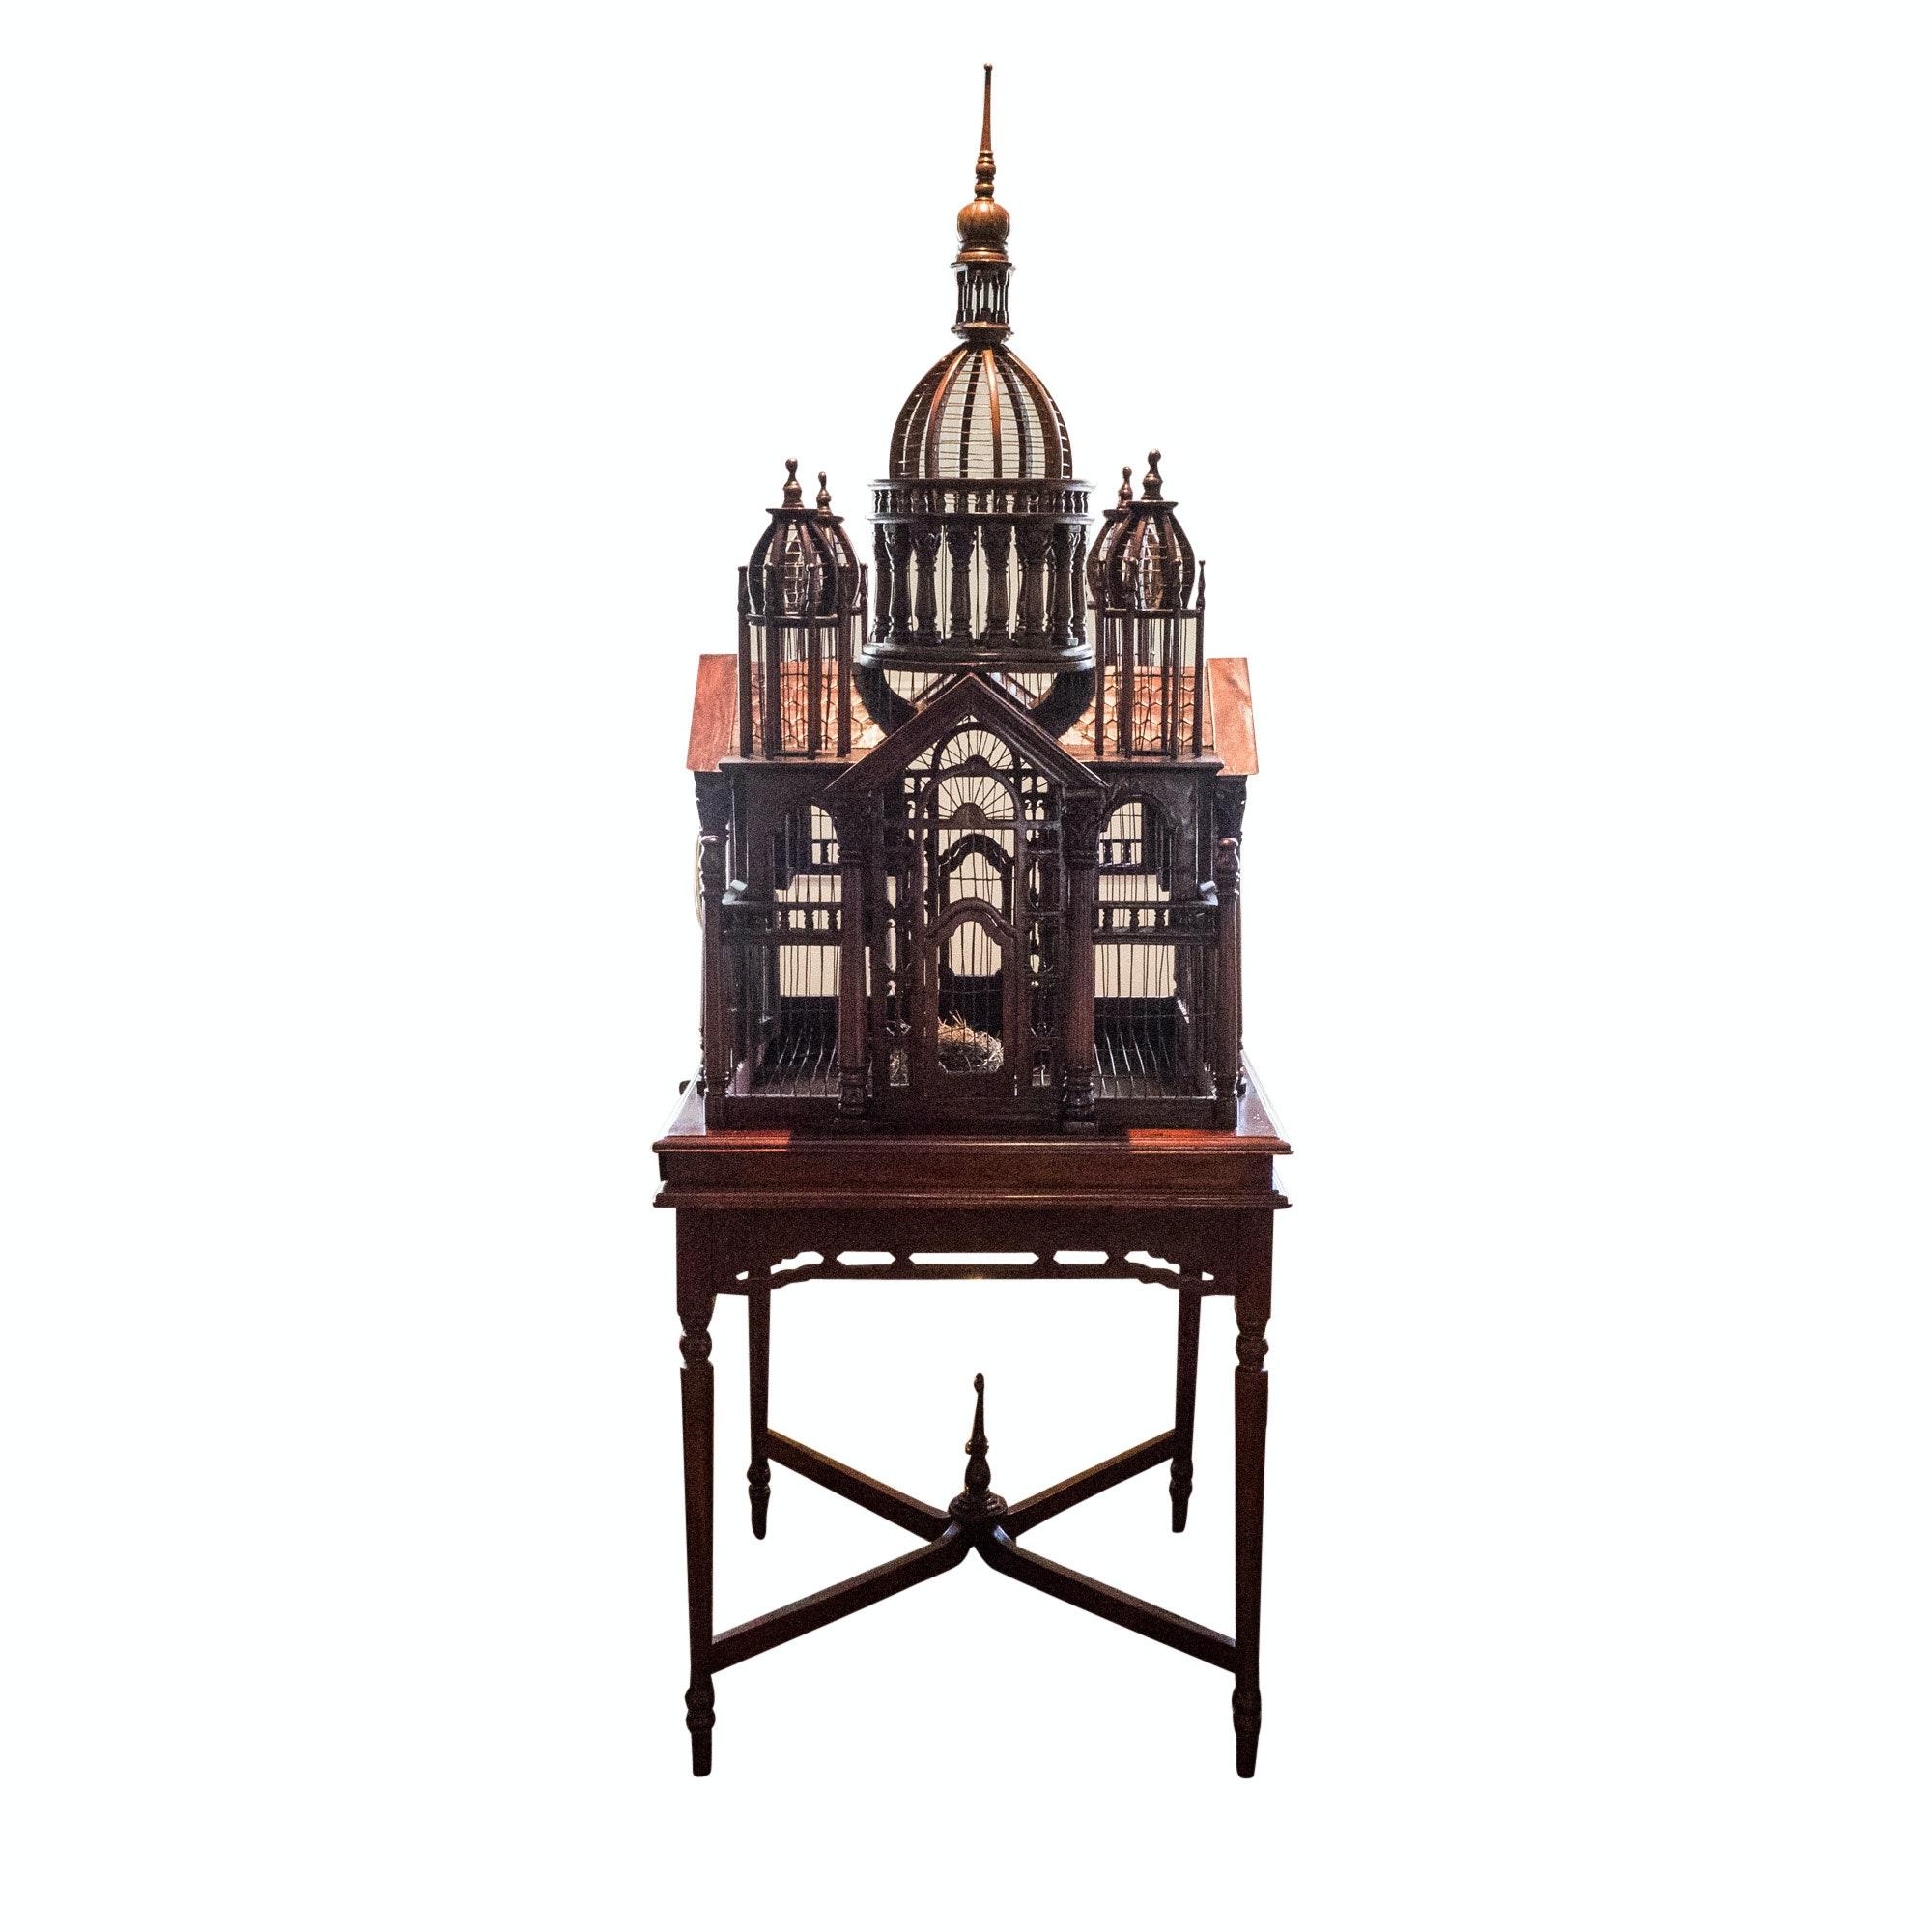 Vintage Victorian Style Architectural Birdcage